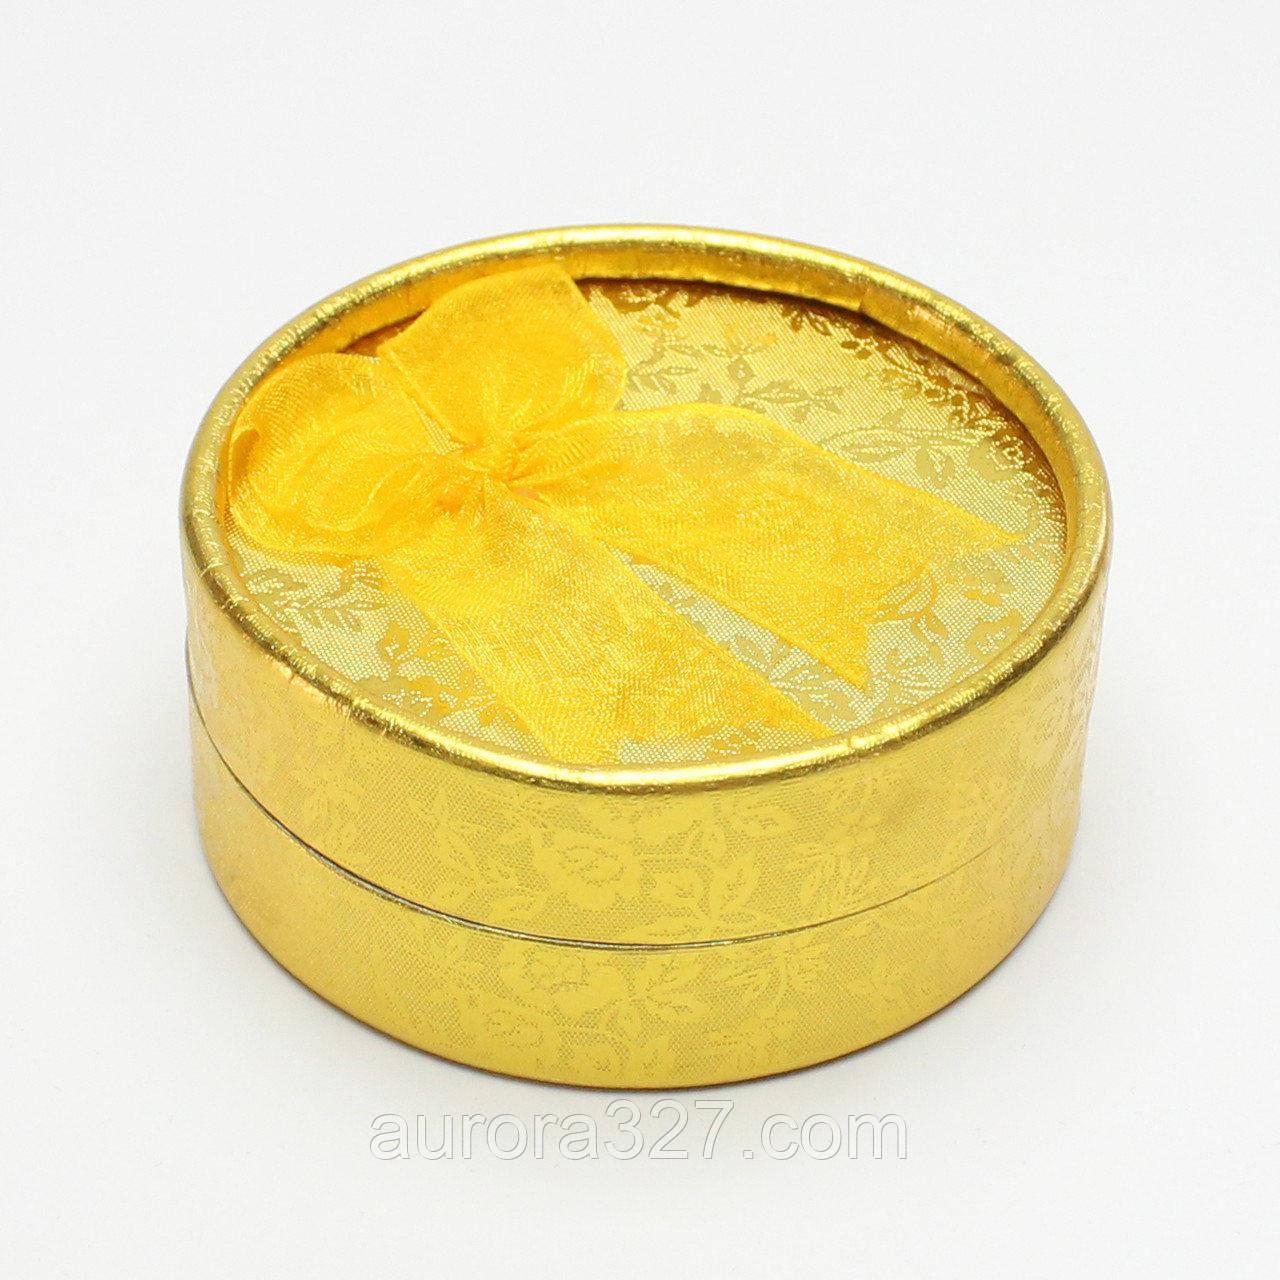 Коробочка для кольца Круг золото 8,5*8,5*3,5 см